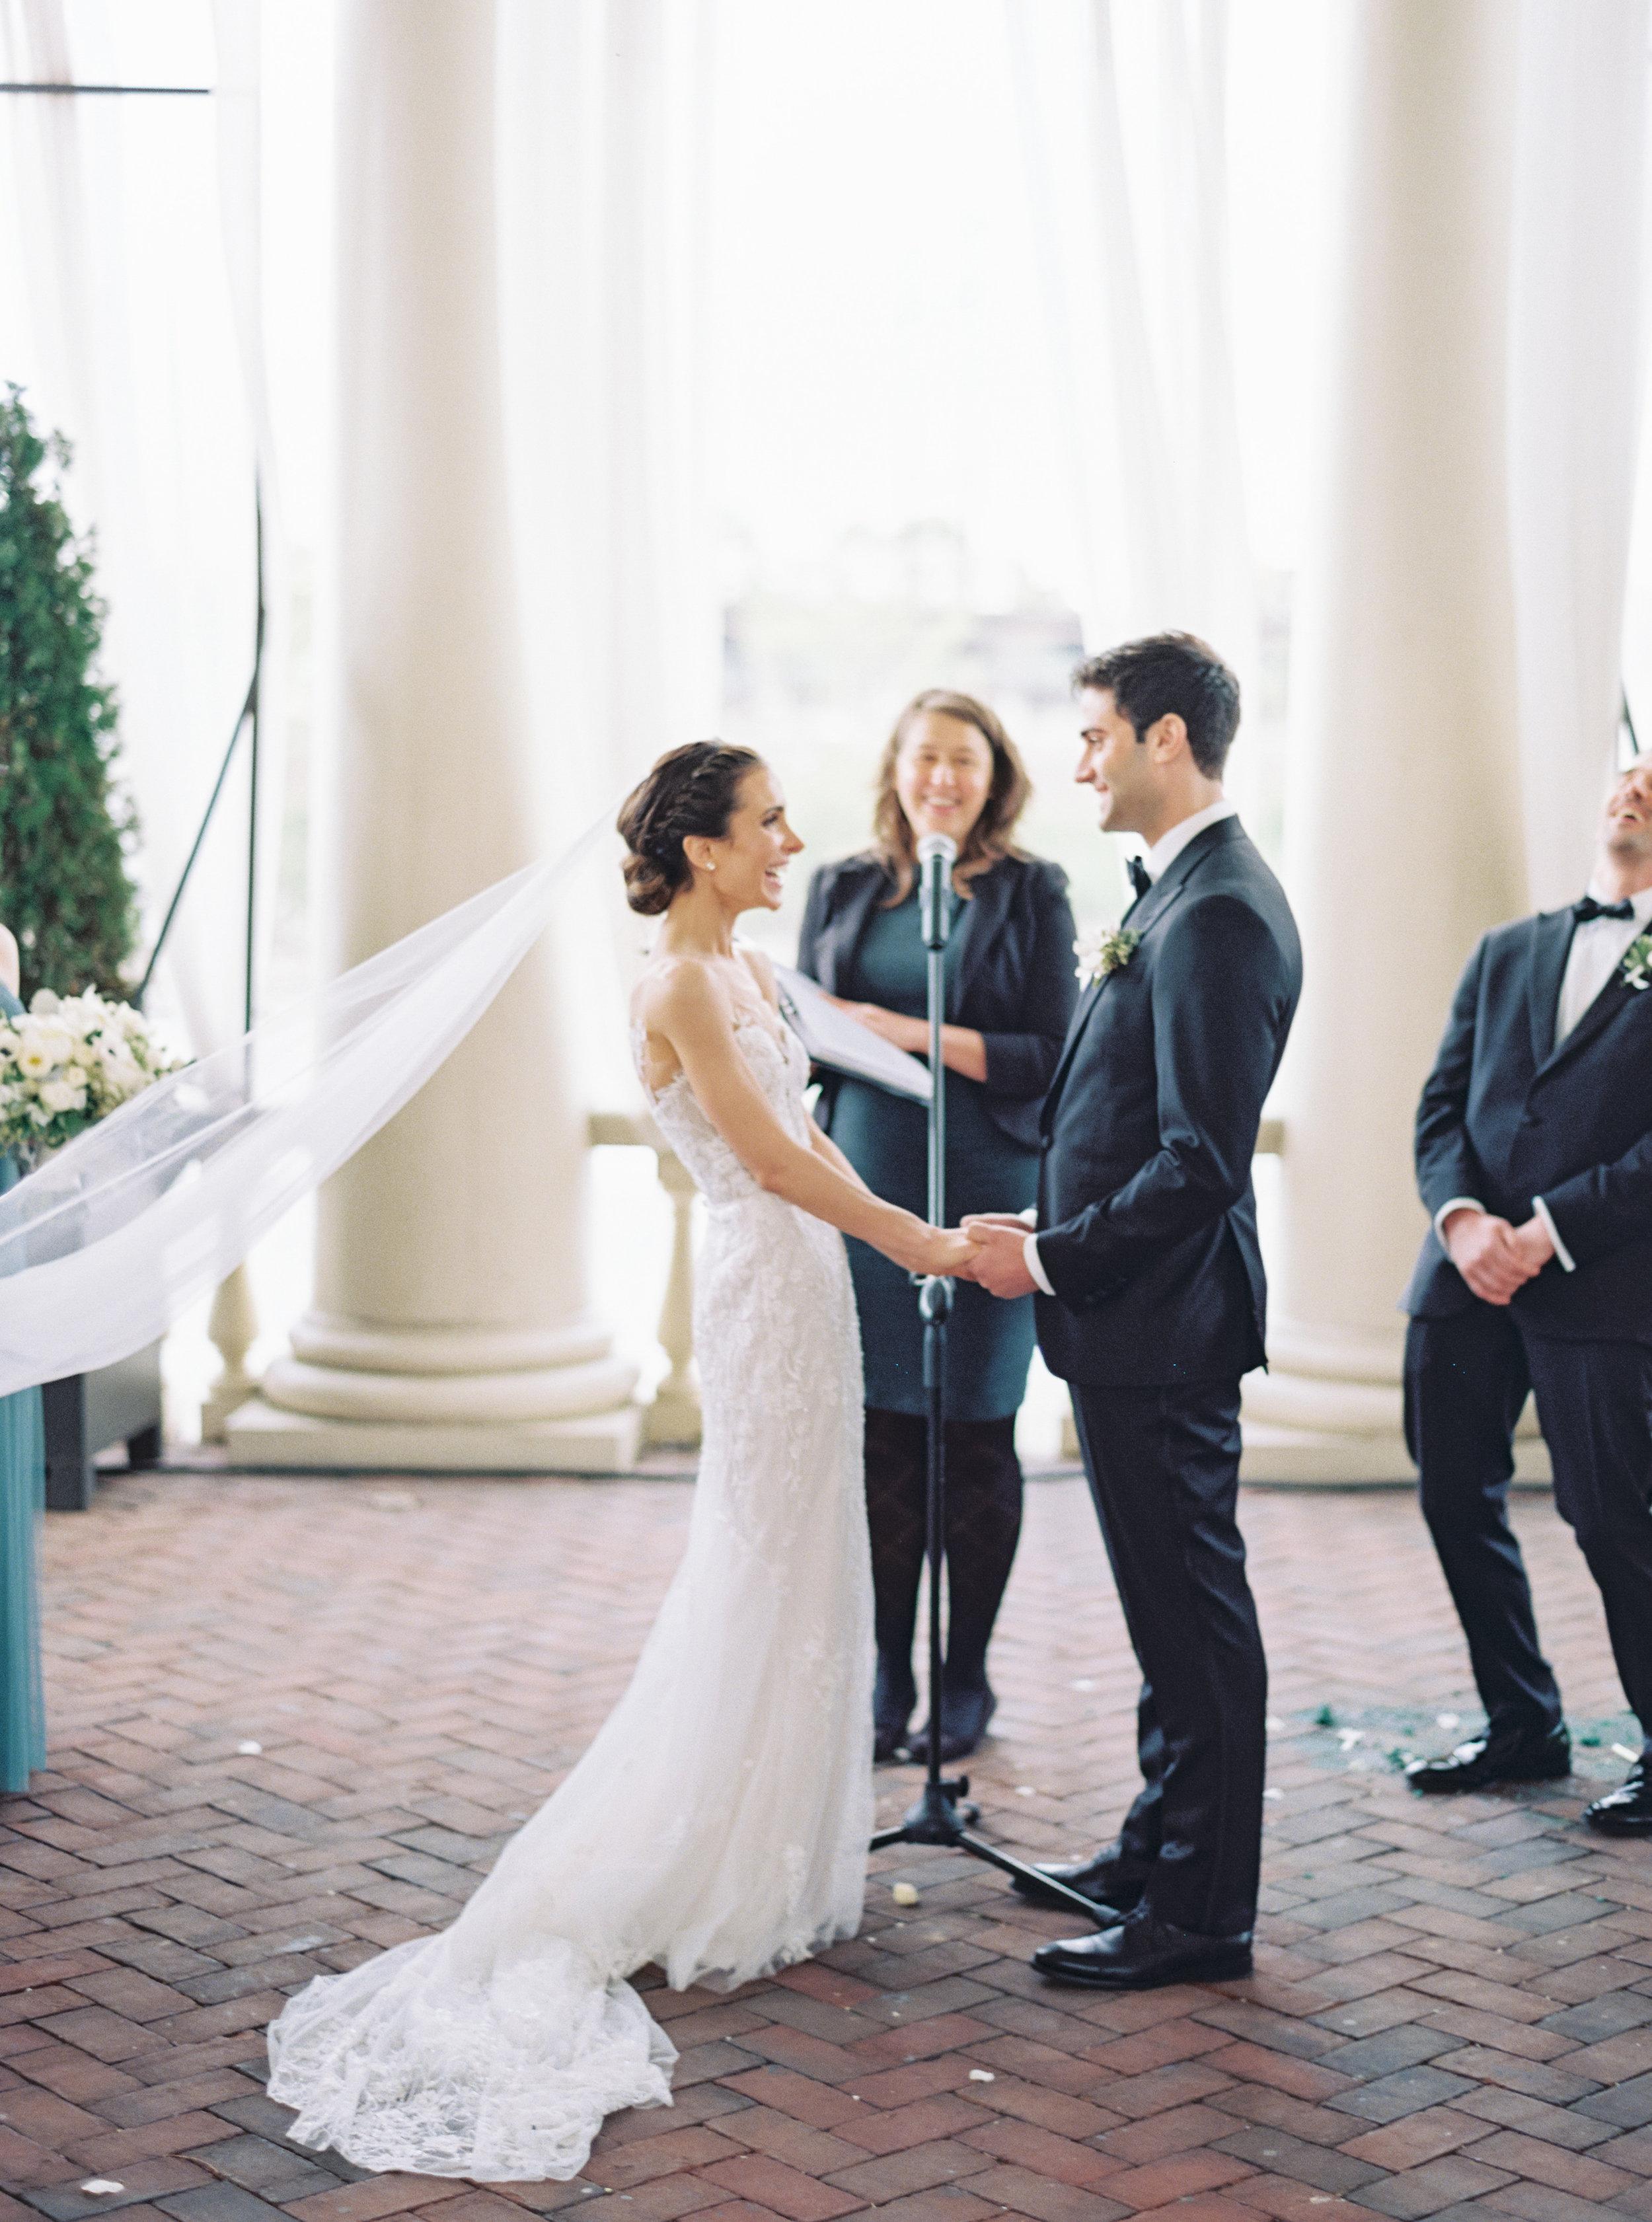 Philadelphia Wedding Planner - WaterWorks - Philly0-99.jpg